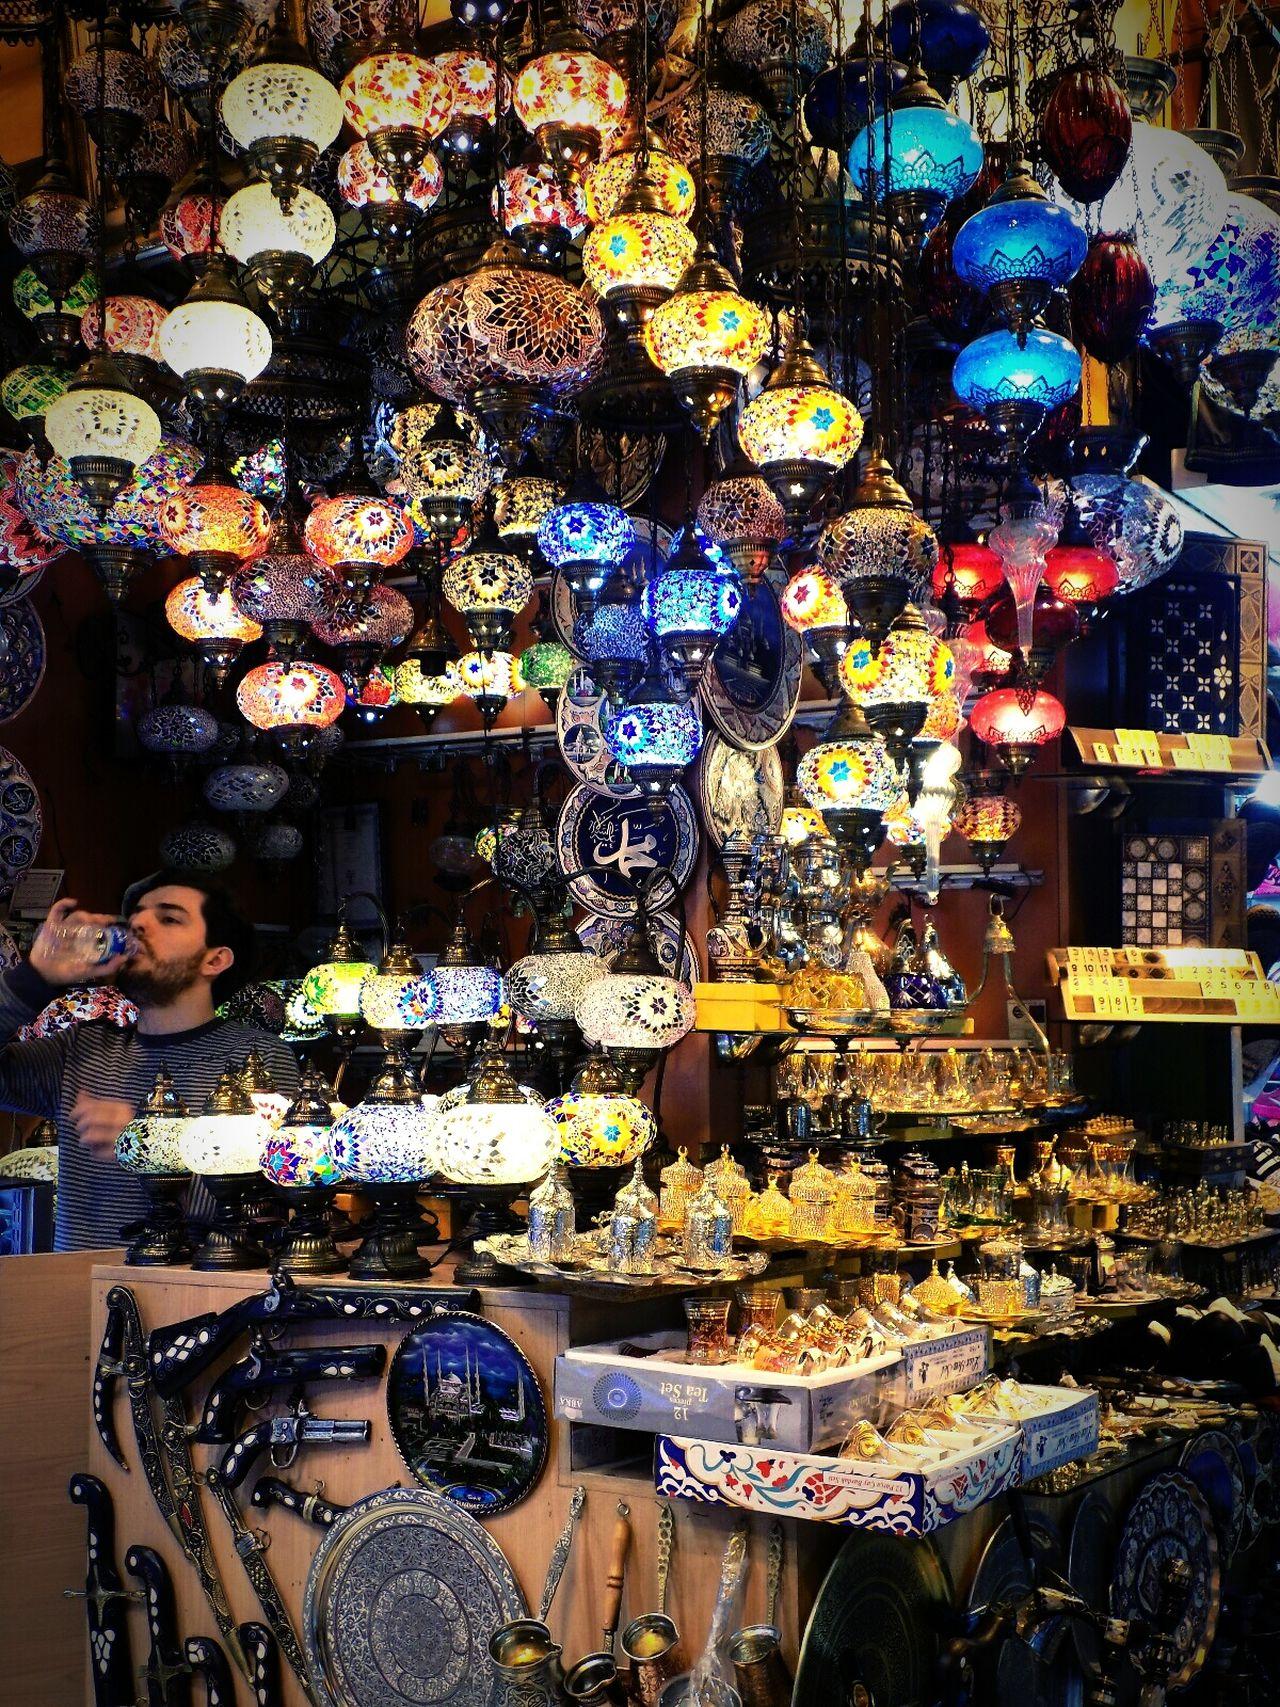 Turkey Istanbul Trip Lights Egyptian Bazaar Oldmarket Orient Oriental Lanterns Colorful